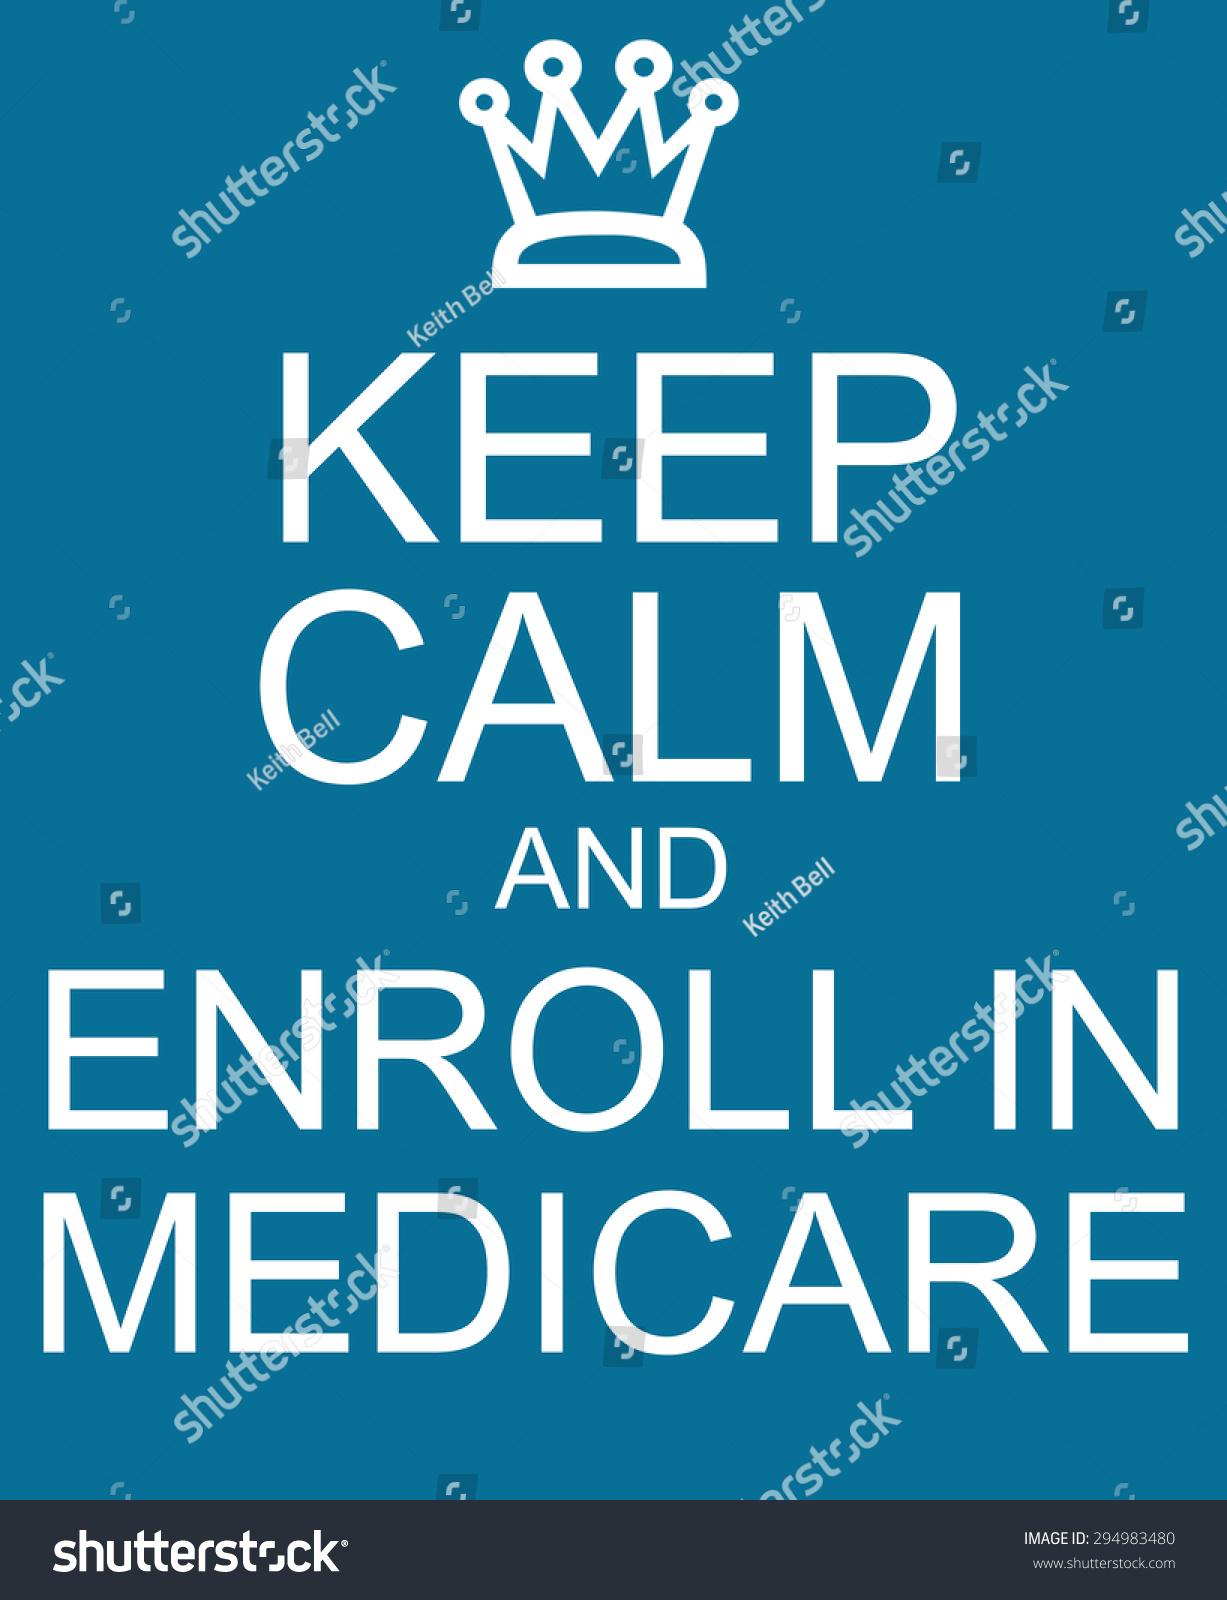 keep calm enroll medicare blue sign stock illustration 294983480